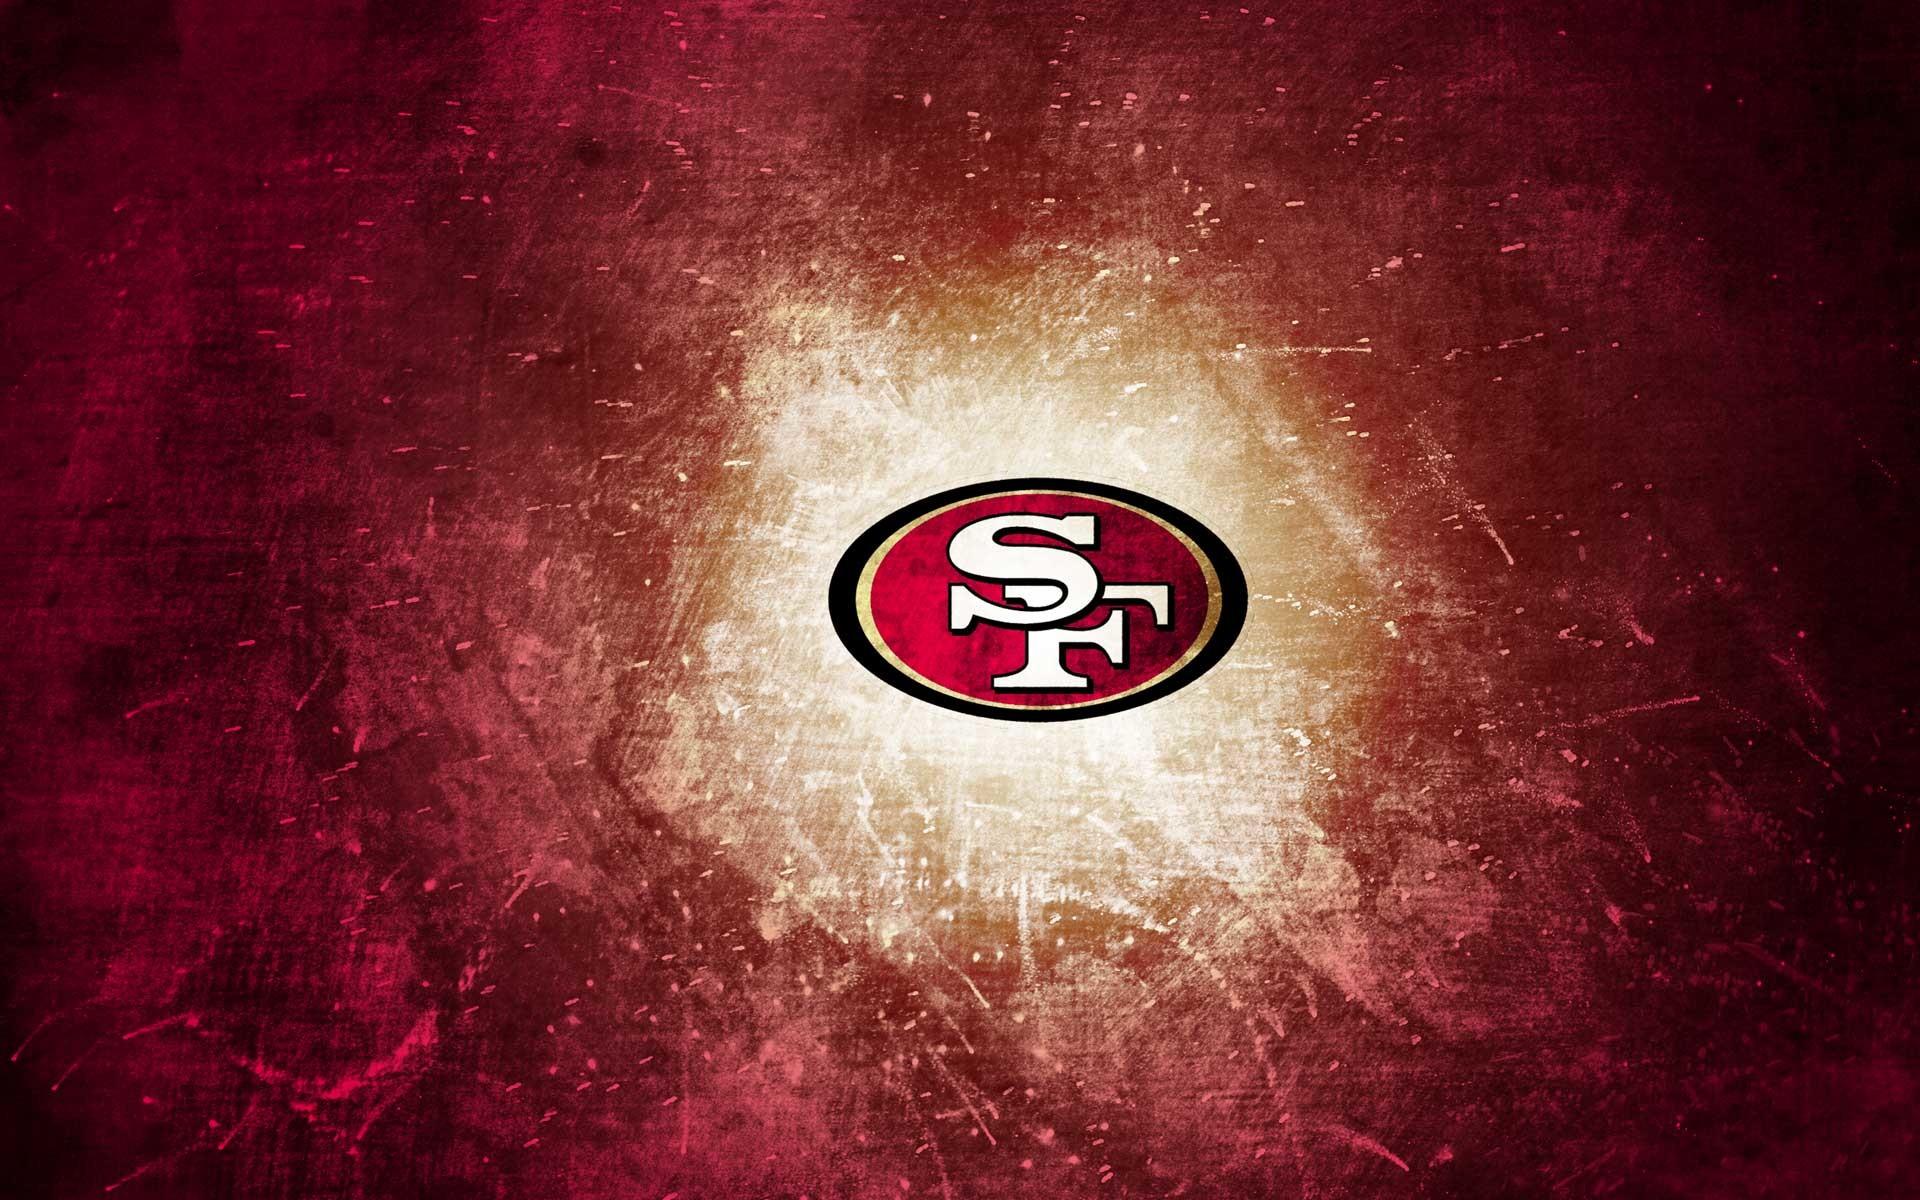 San Francisco 49ers. Wallpaper. Fútbol americano. Logo. | San Francisco  49ers. Equipo de Fútbol Americano. | Pinterest | San francisco 49ers